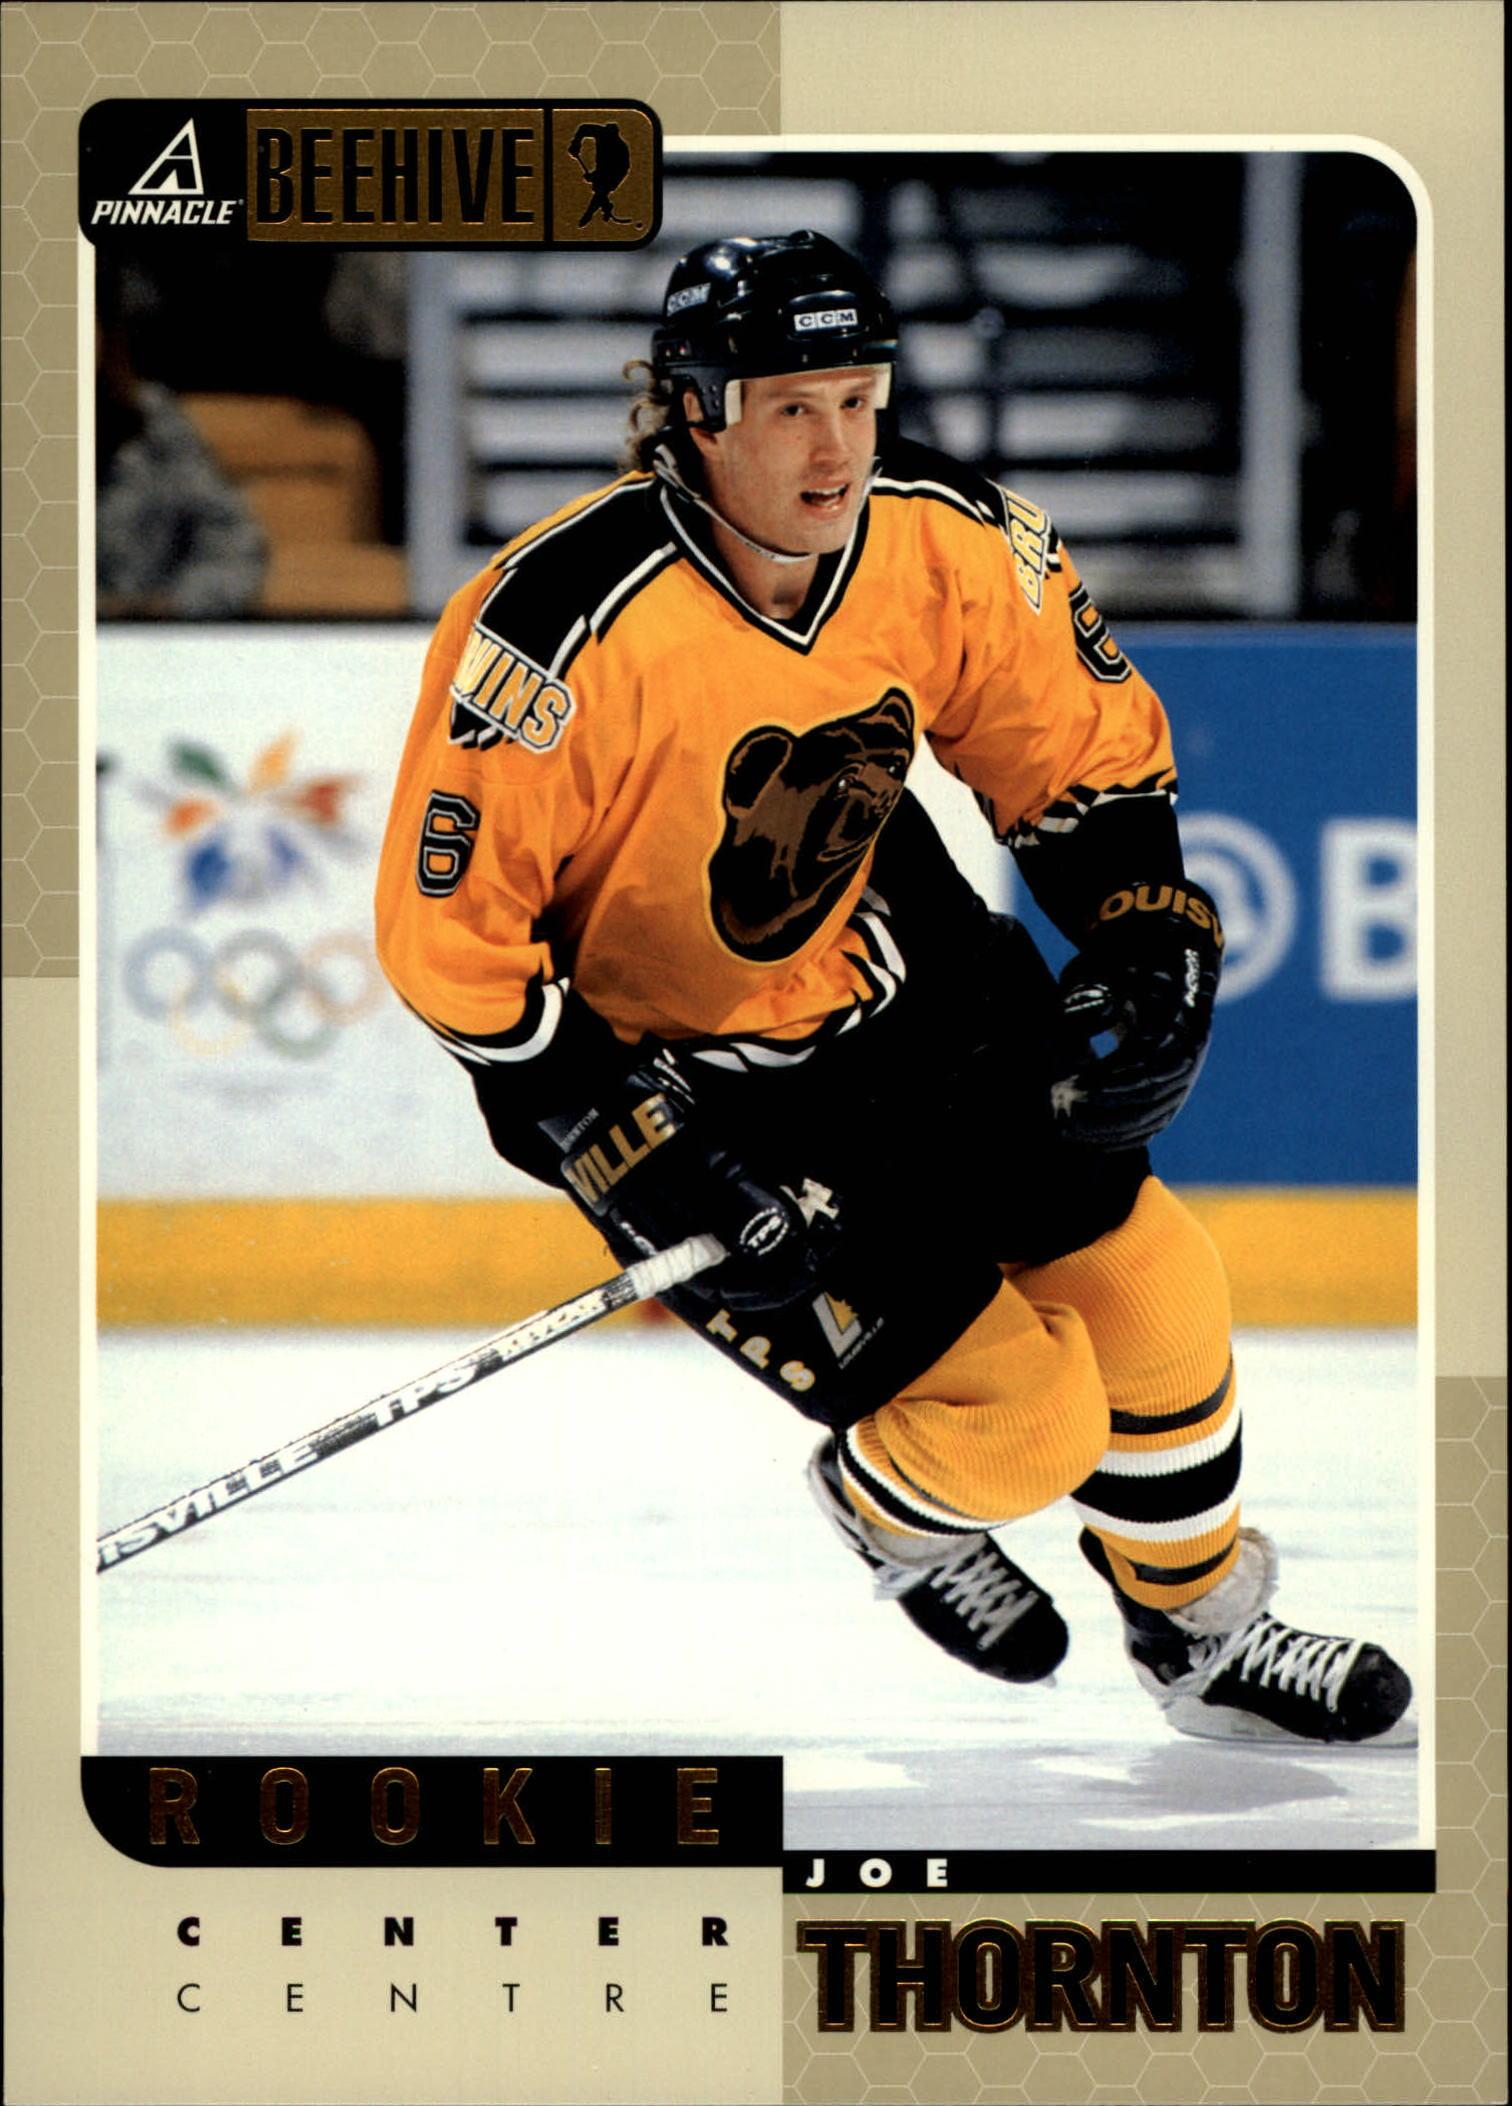 1997-98 Beehive #51 Joe Thornton